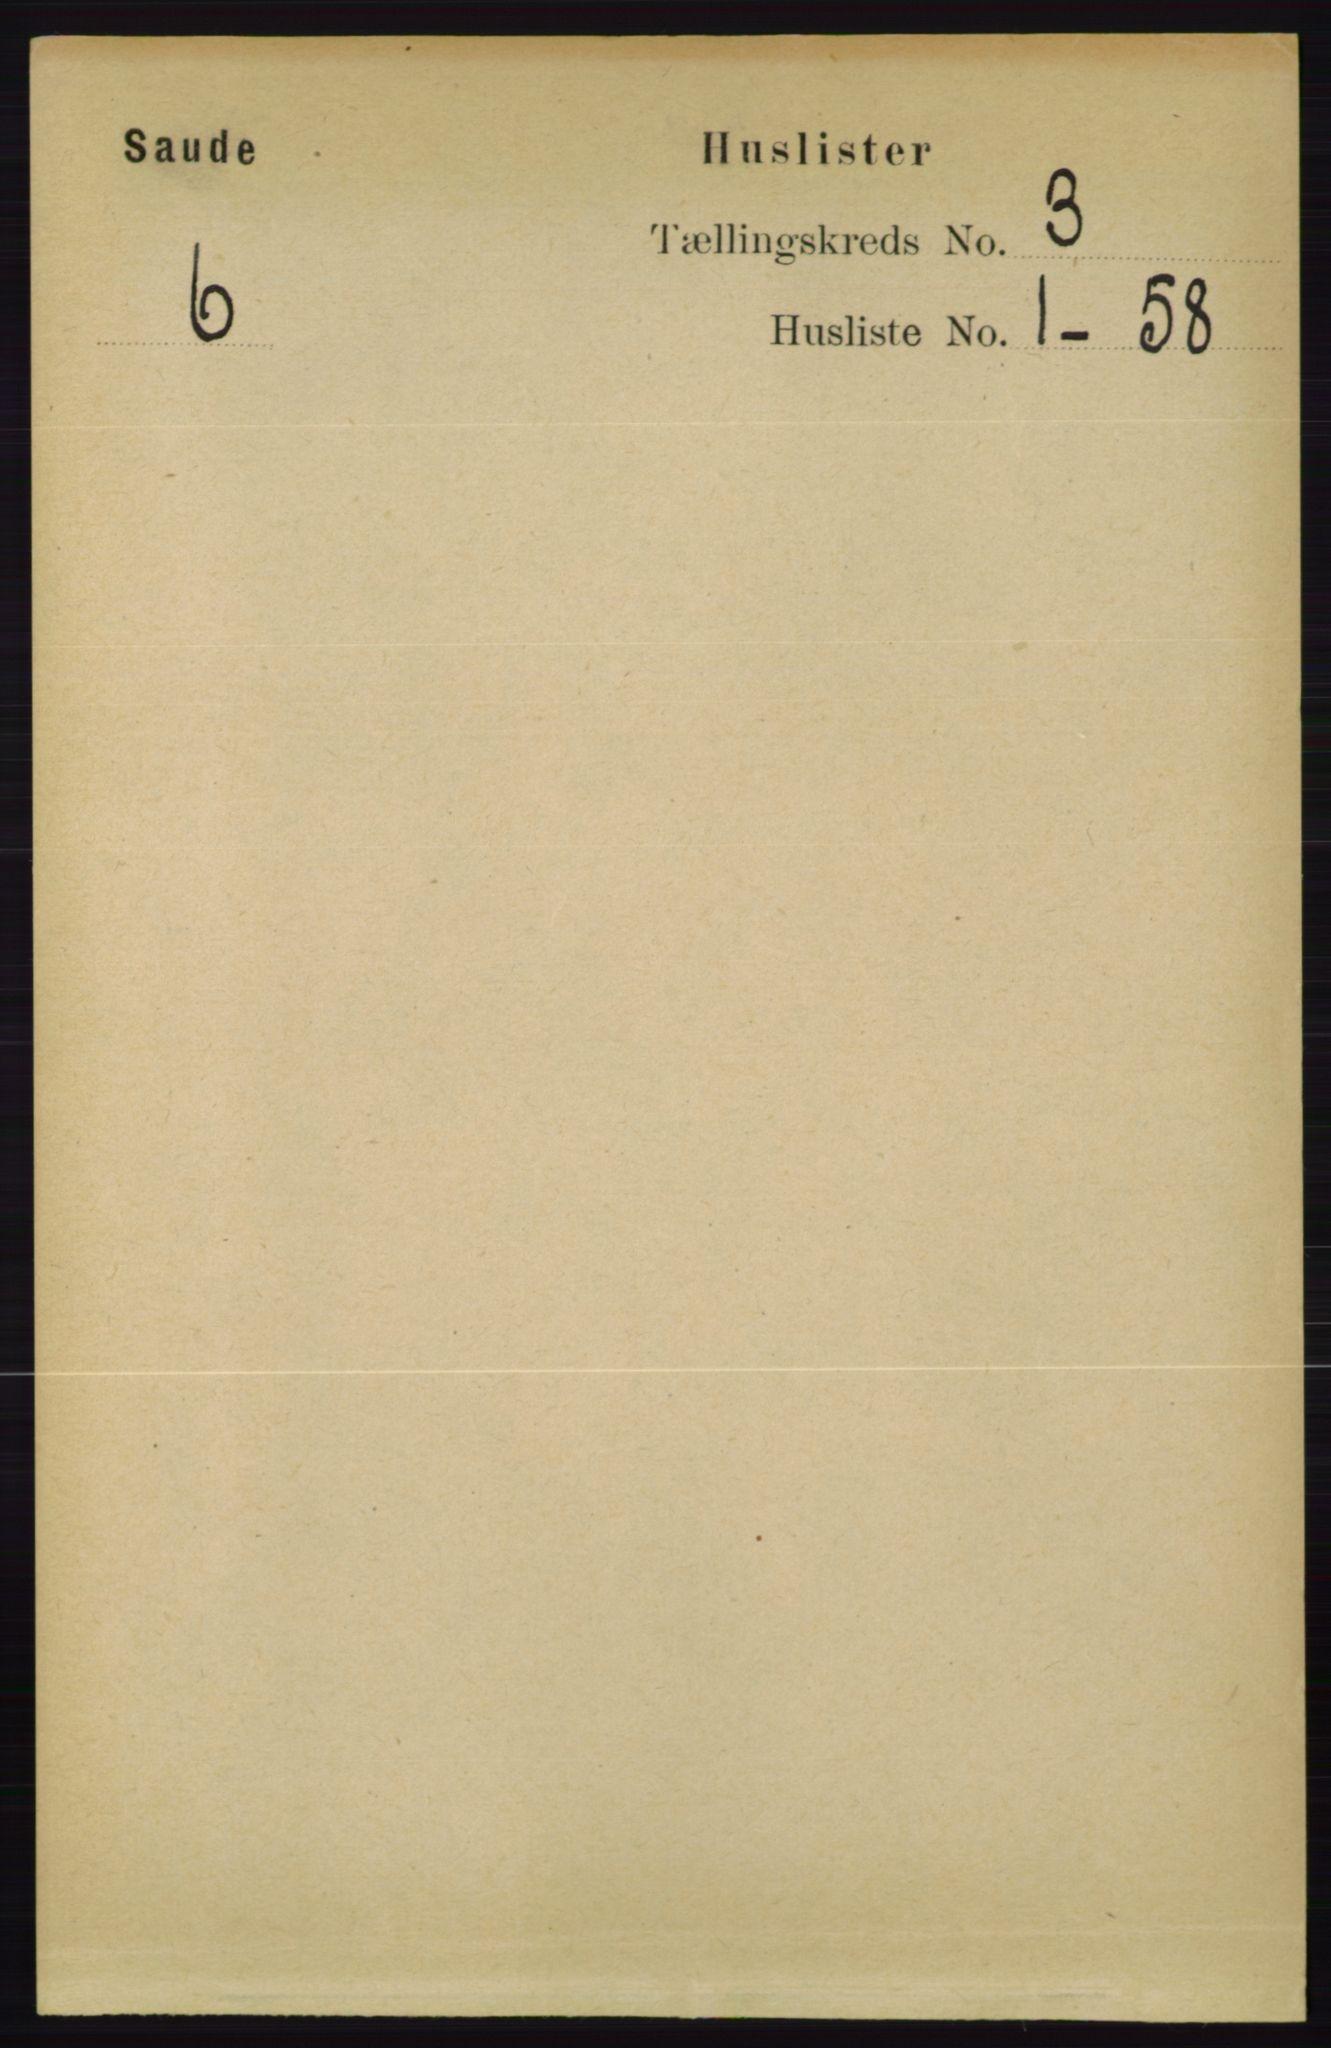 RA, Folketelling 1891 for 0822 Sauherad herred, 1891, s. 667